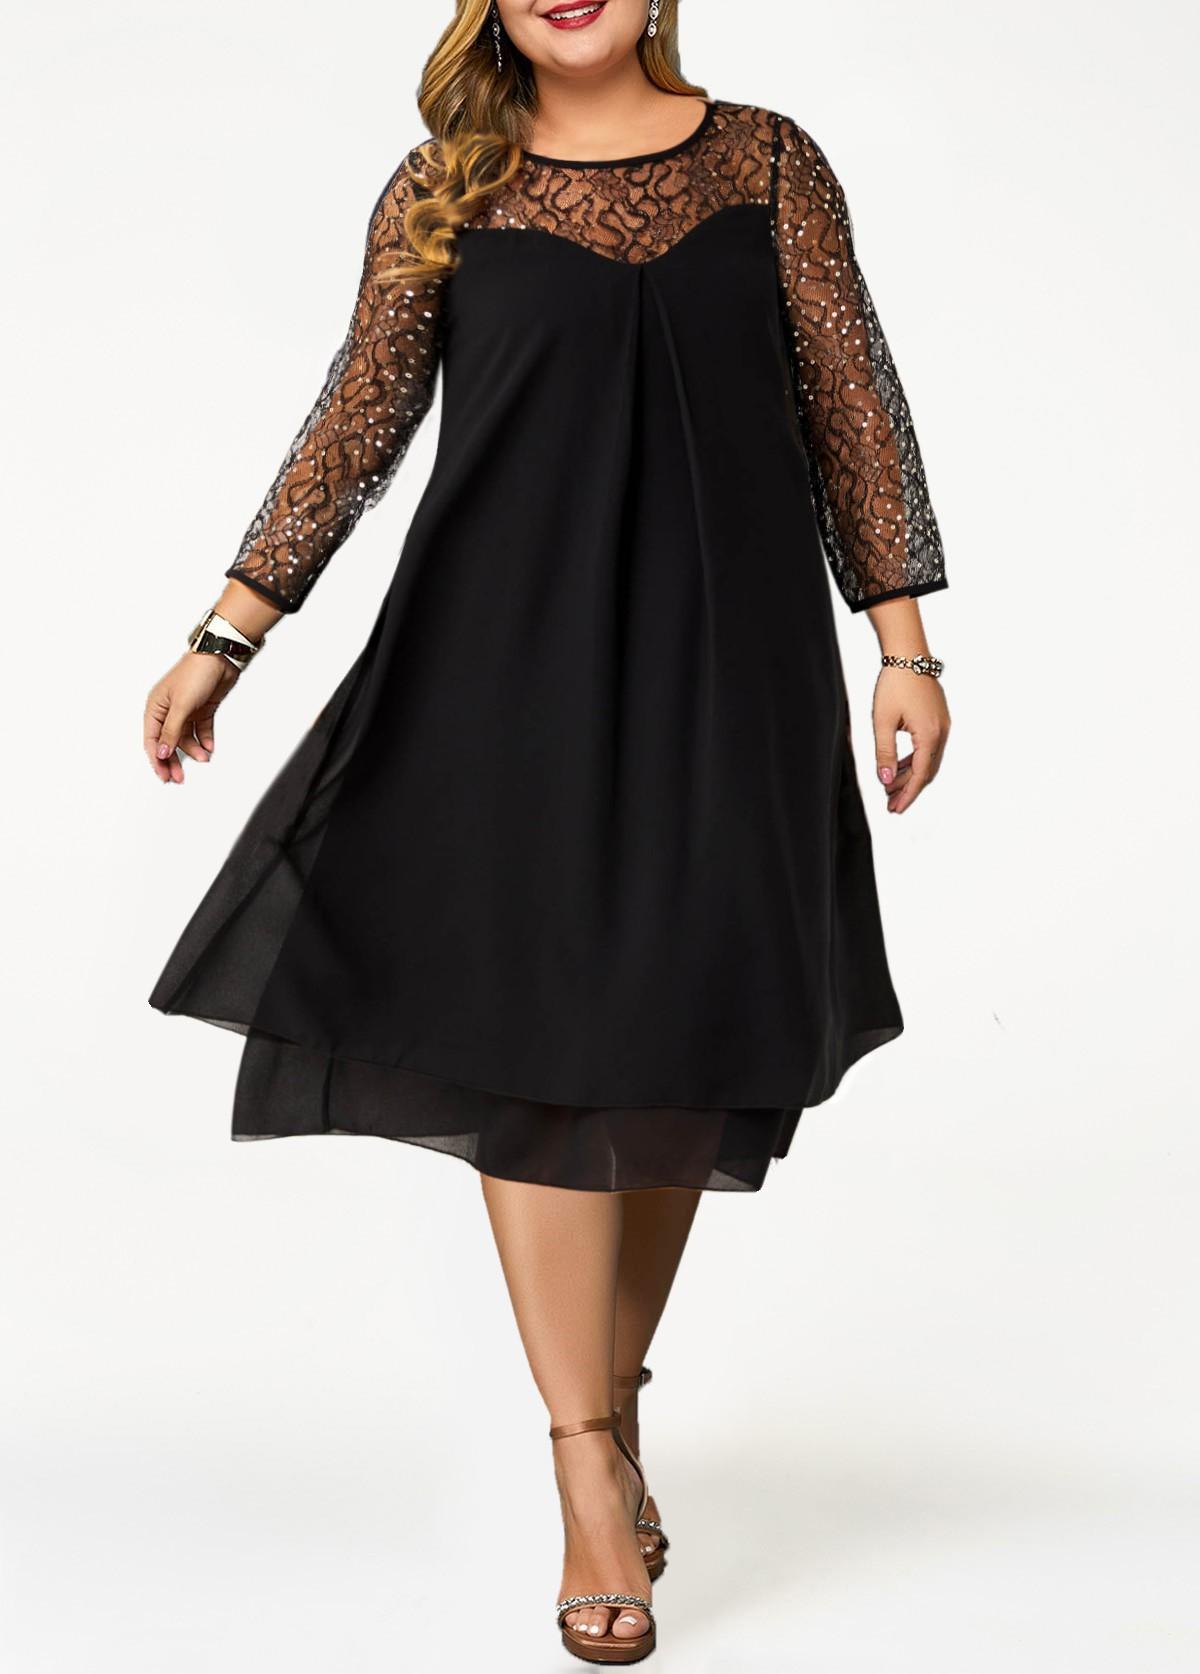 Plus Size Round Neck Sequin 3/4 Sleeve Dress